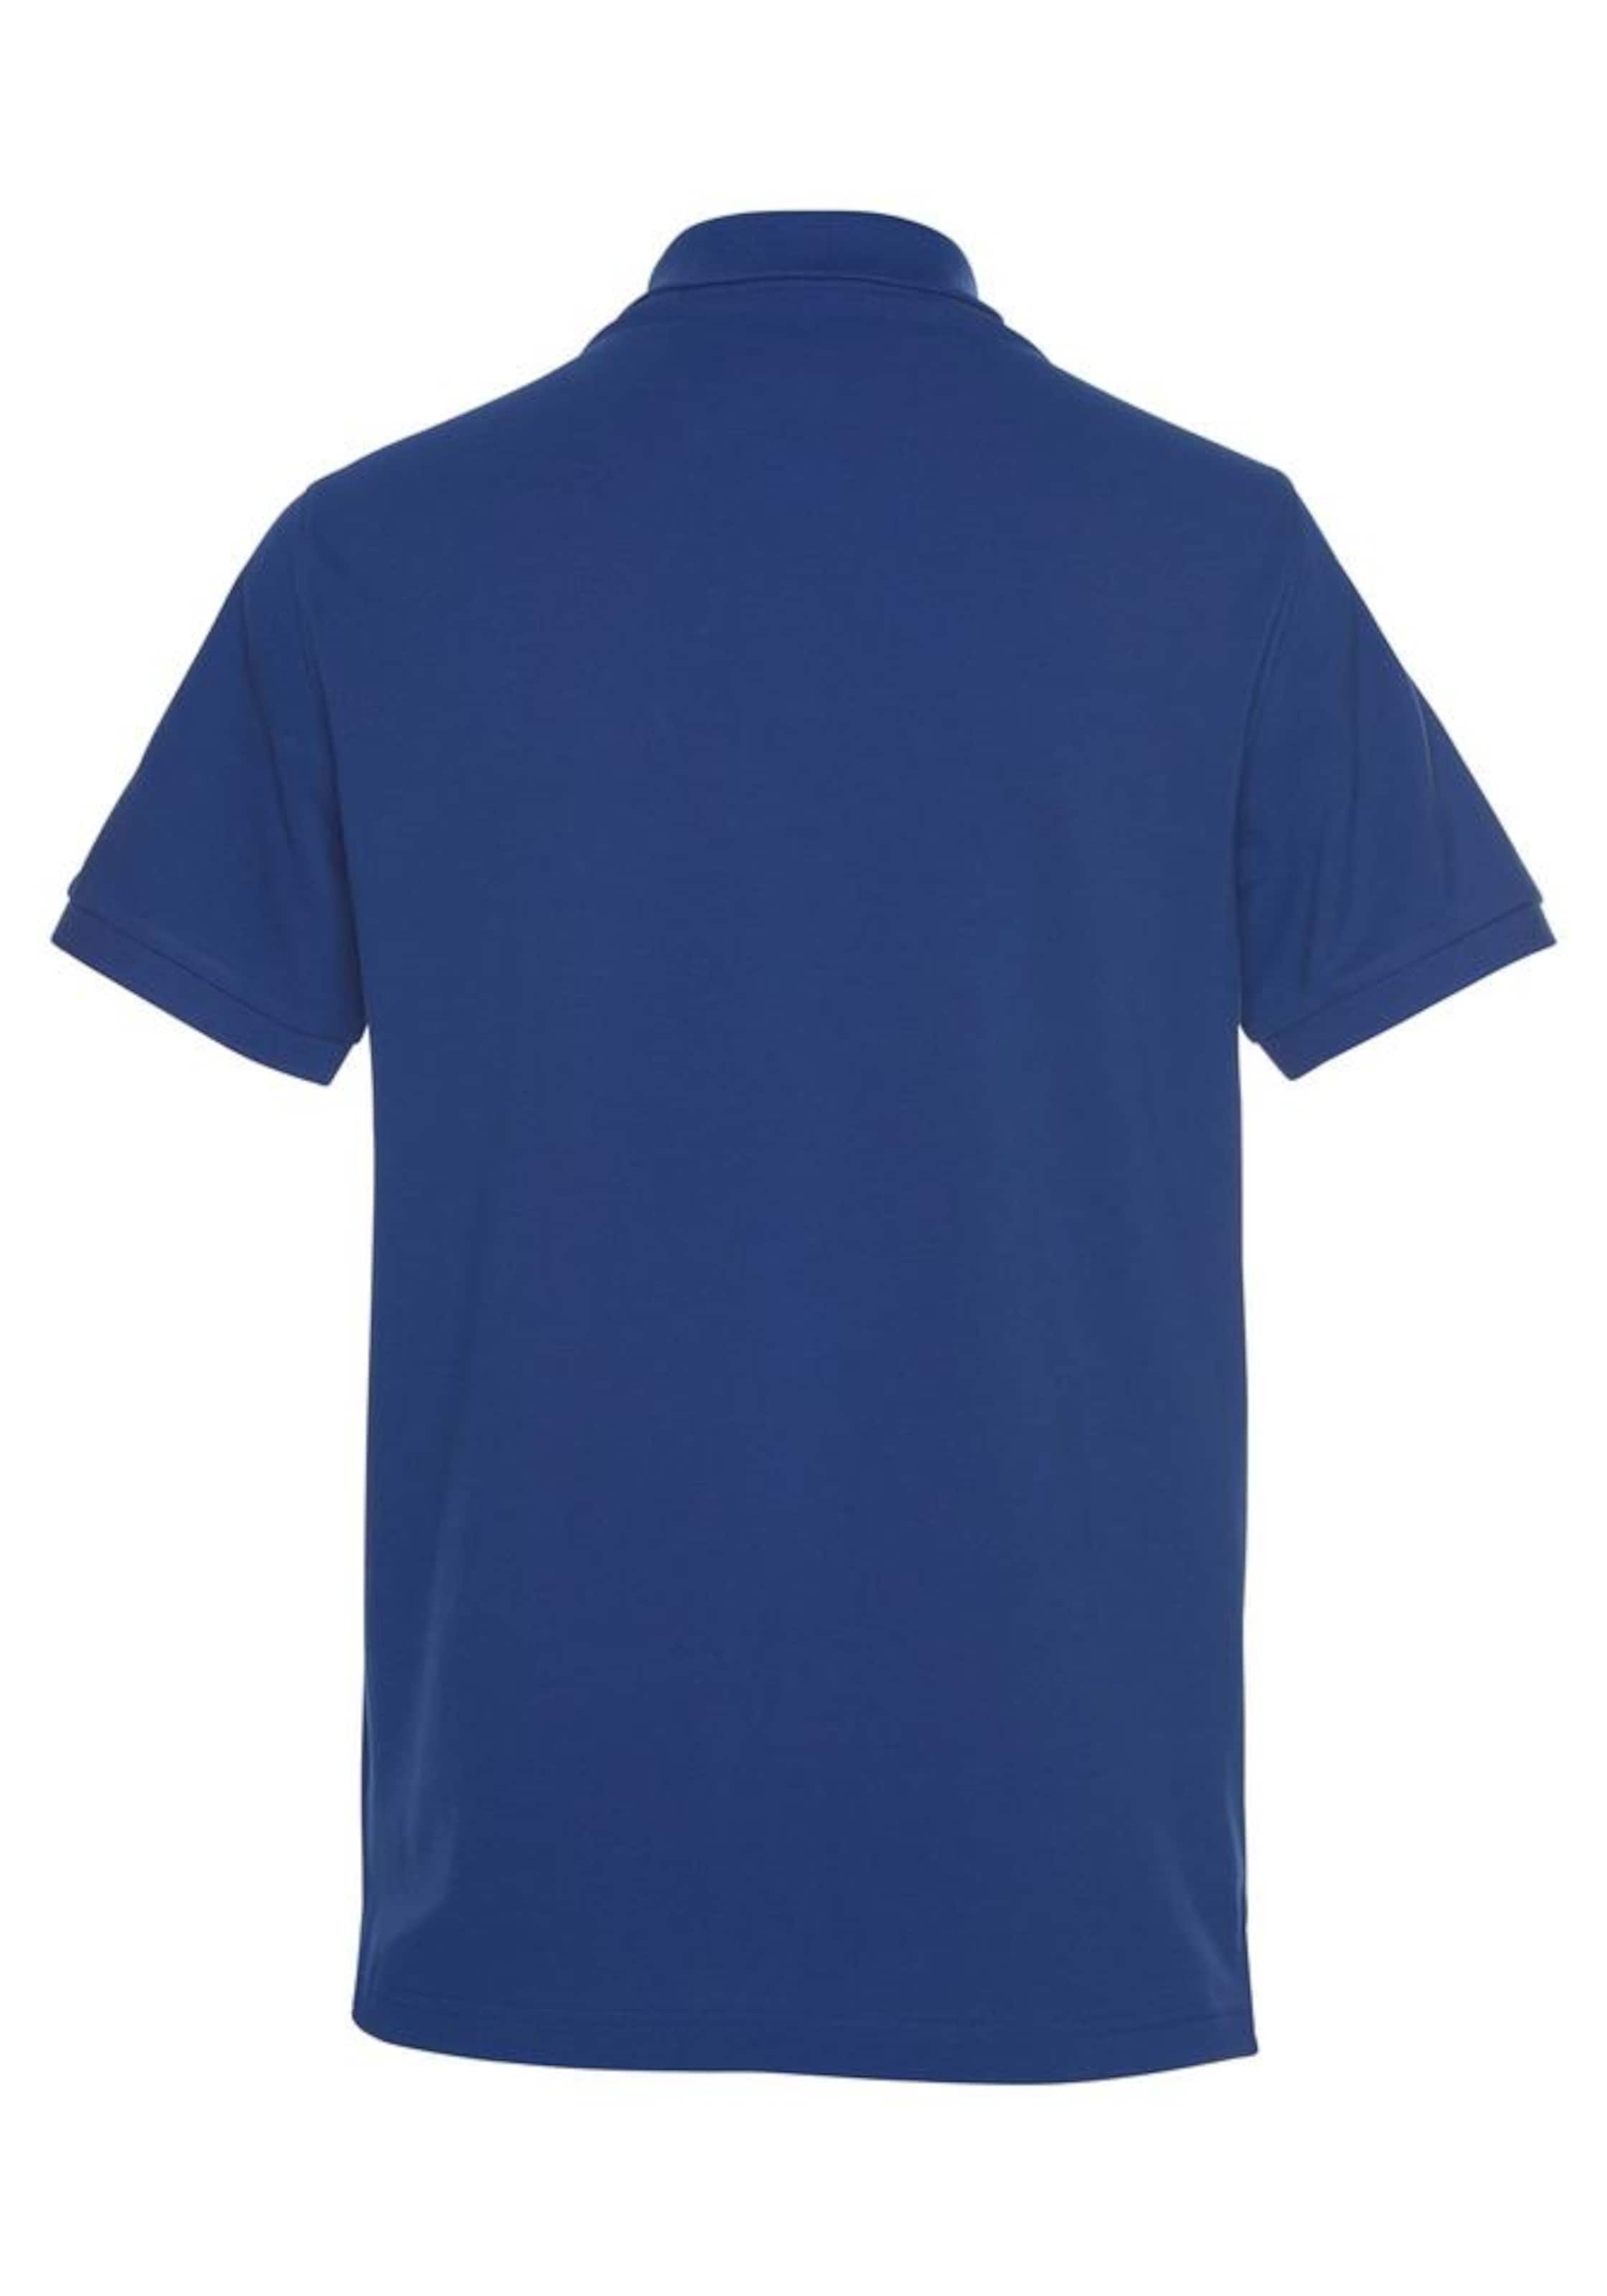 GANT Gant Poloshirt in blau Unifarben 940553930